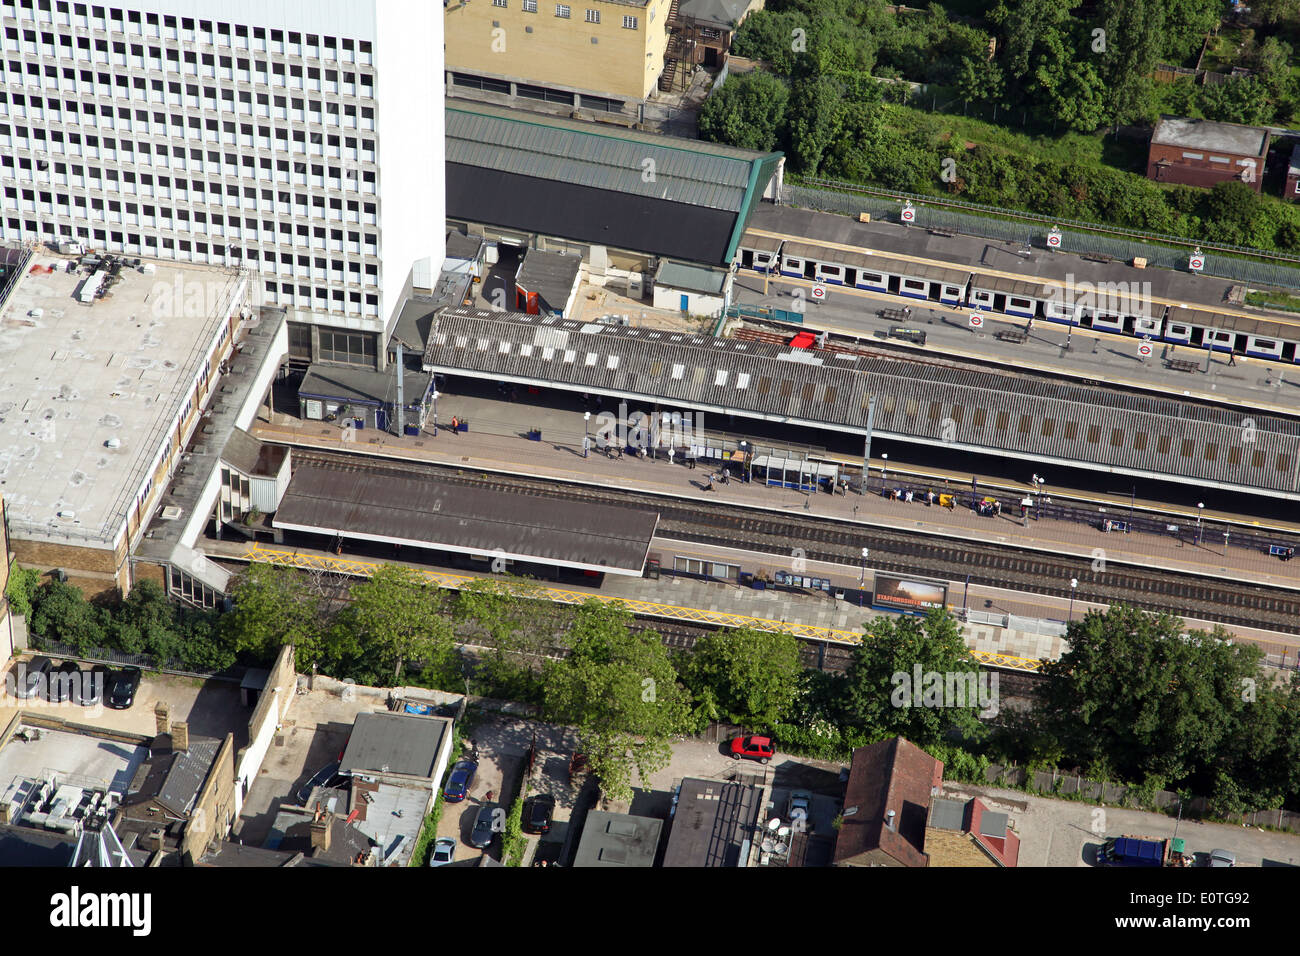 aerial view of London Ealing Broadway railway train station London, UK - Stock Image